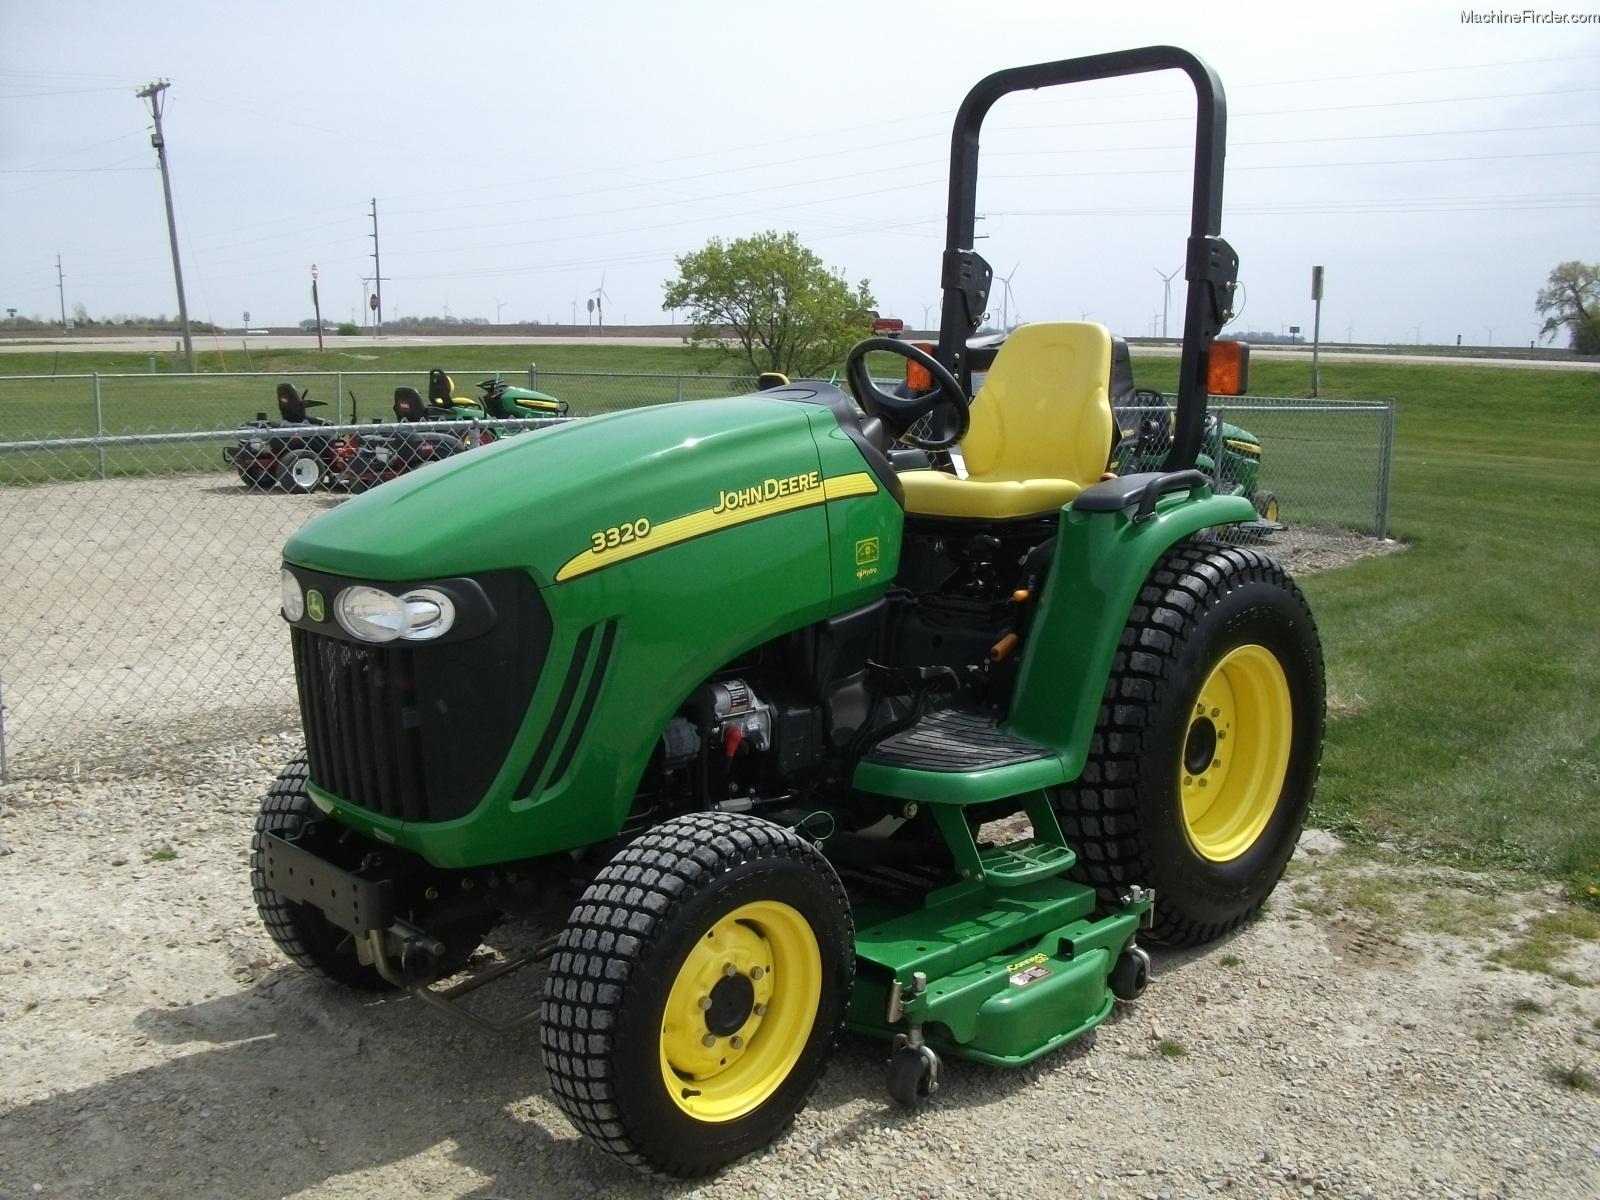 2008 John Deere 3320 Tractors - Compact (1-40hp.) - John ...